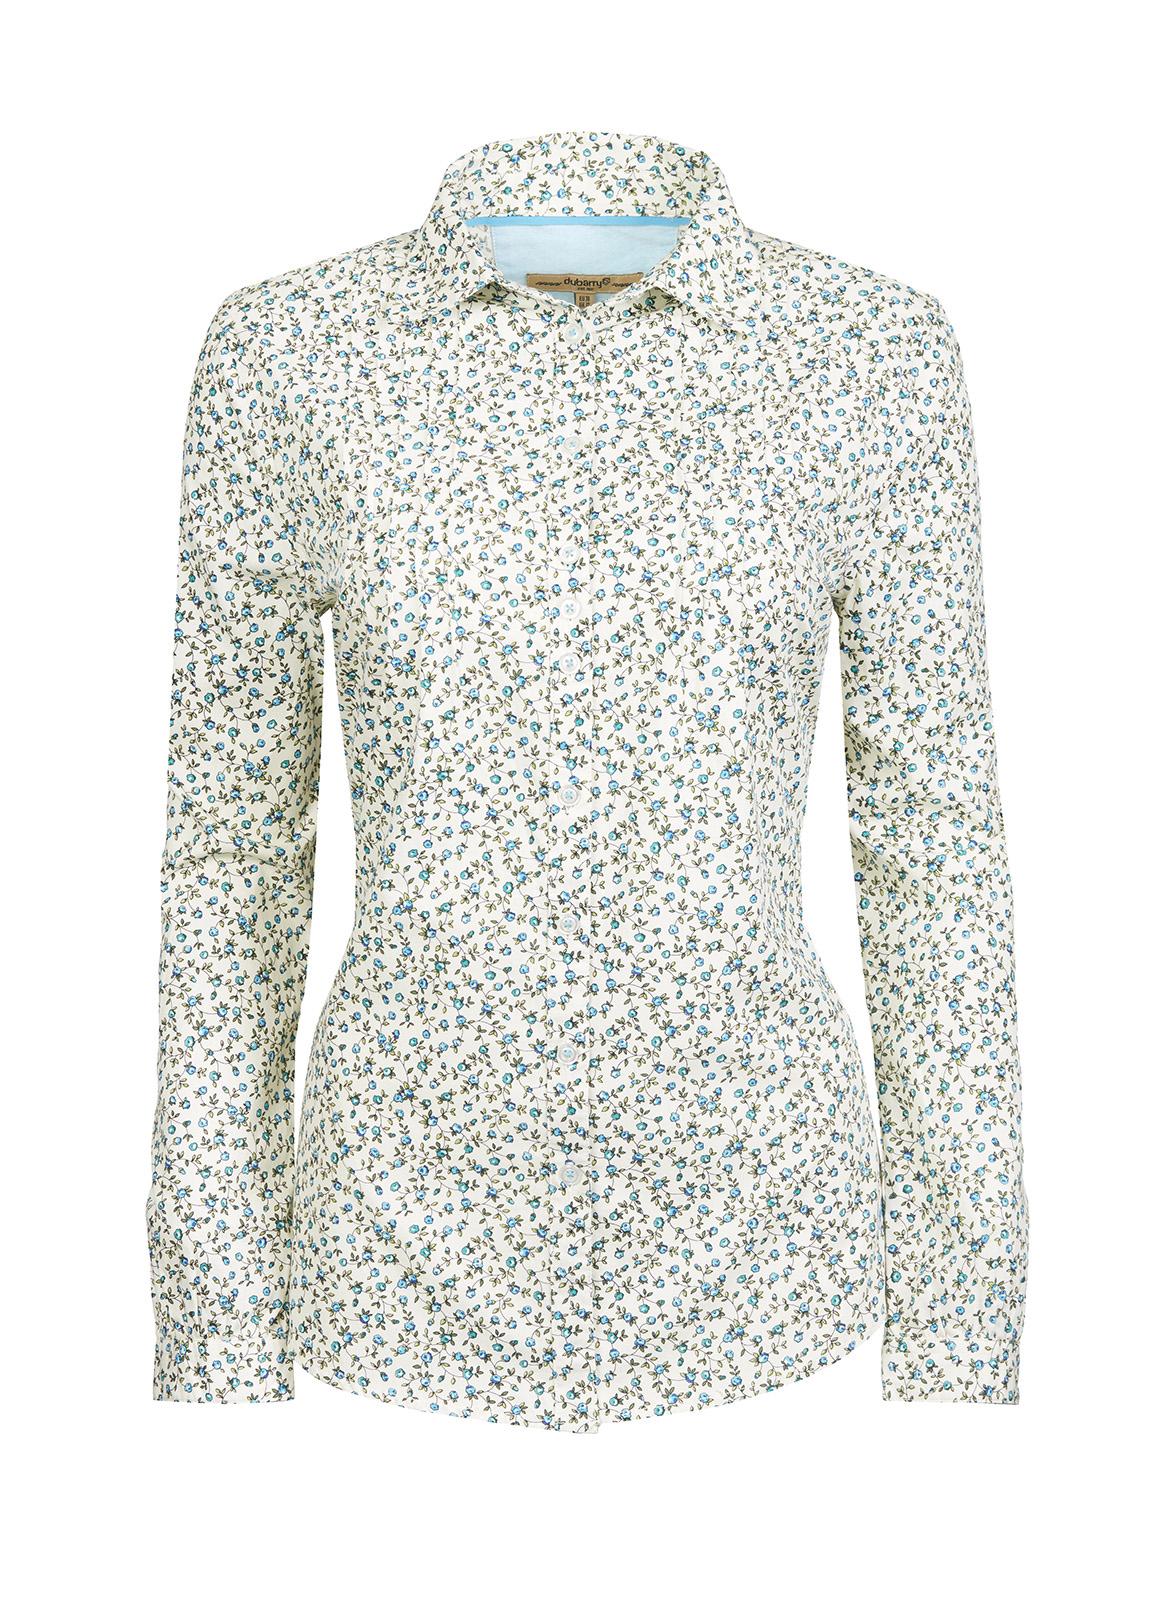 Dubarry_ Brooklime Ladies Shirt - Various_Image_2